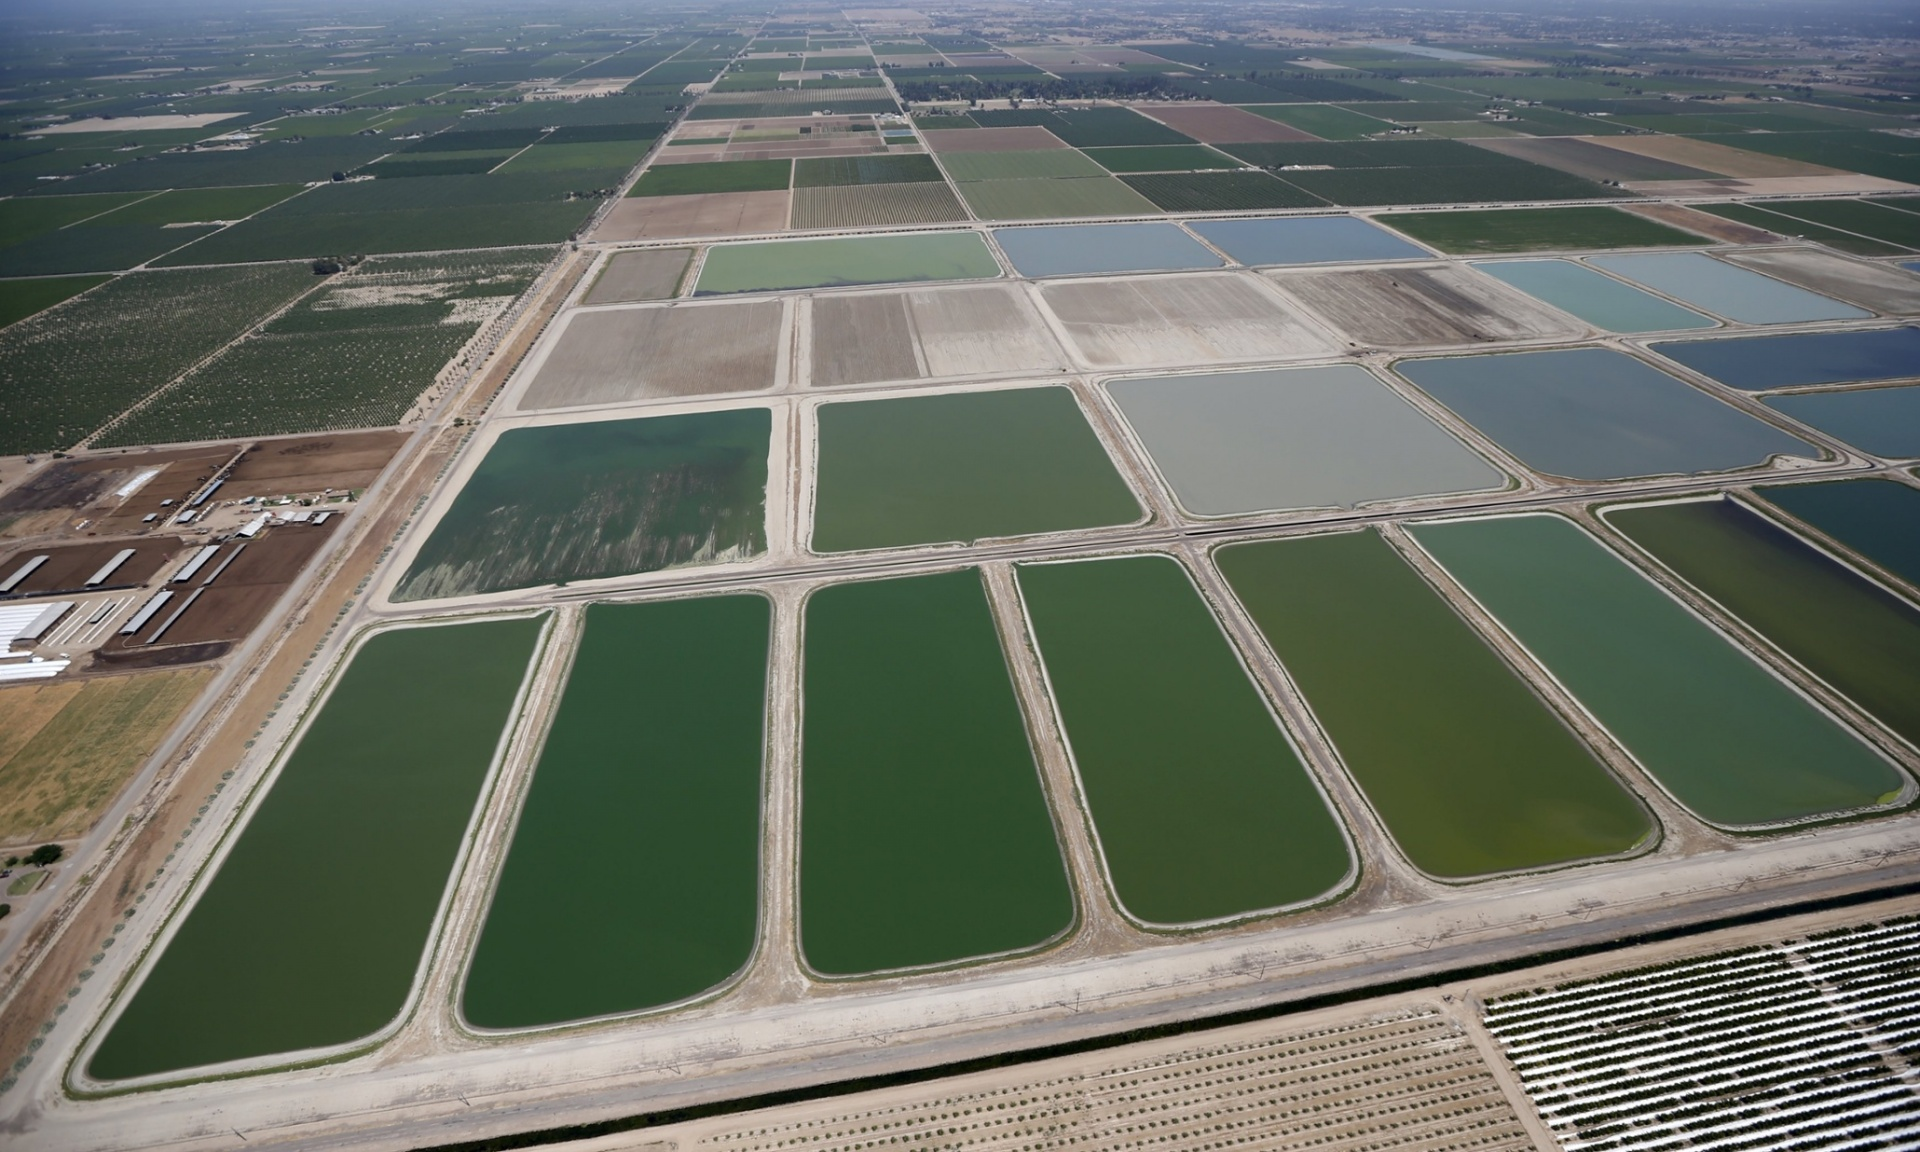 Fresno-Clovis Regional Wastewater Treatment Facility is seen next to farm fields in Fresno [Reuters]